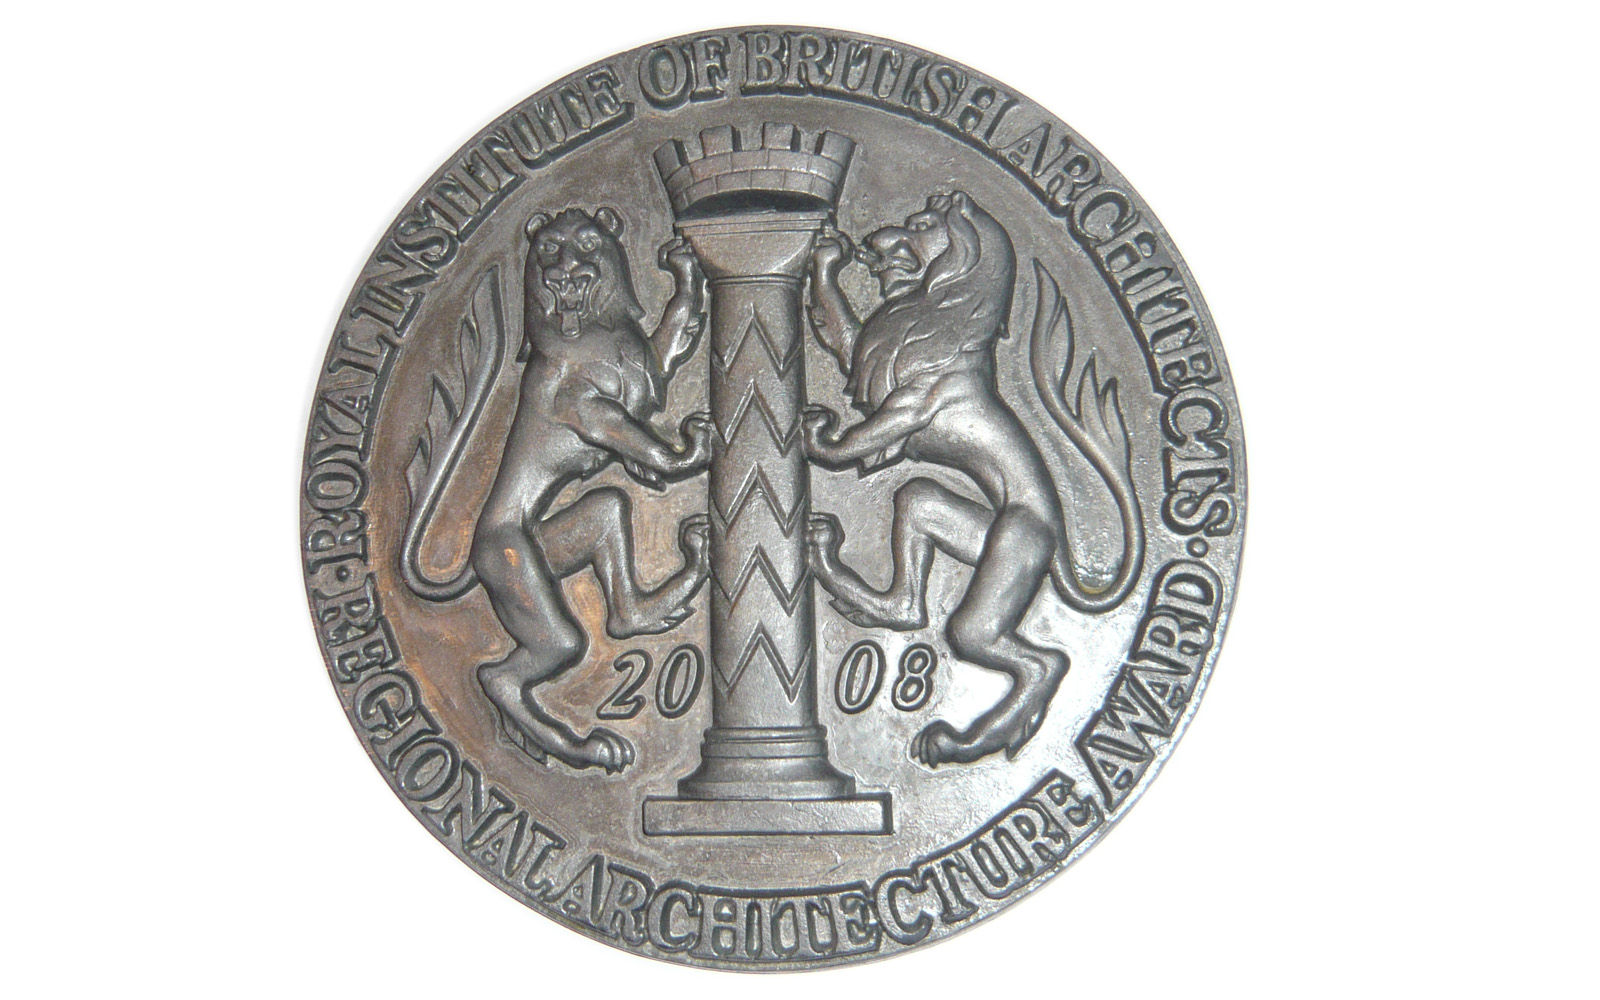 Diamond Construction (2000) Ltd Award